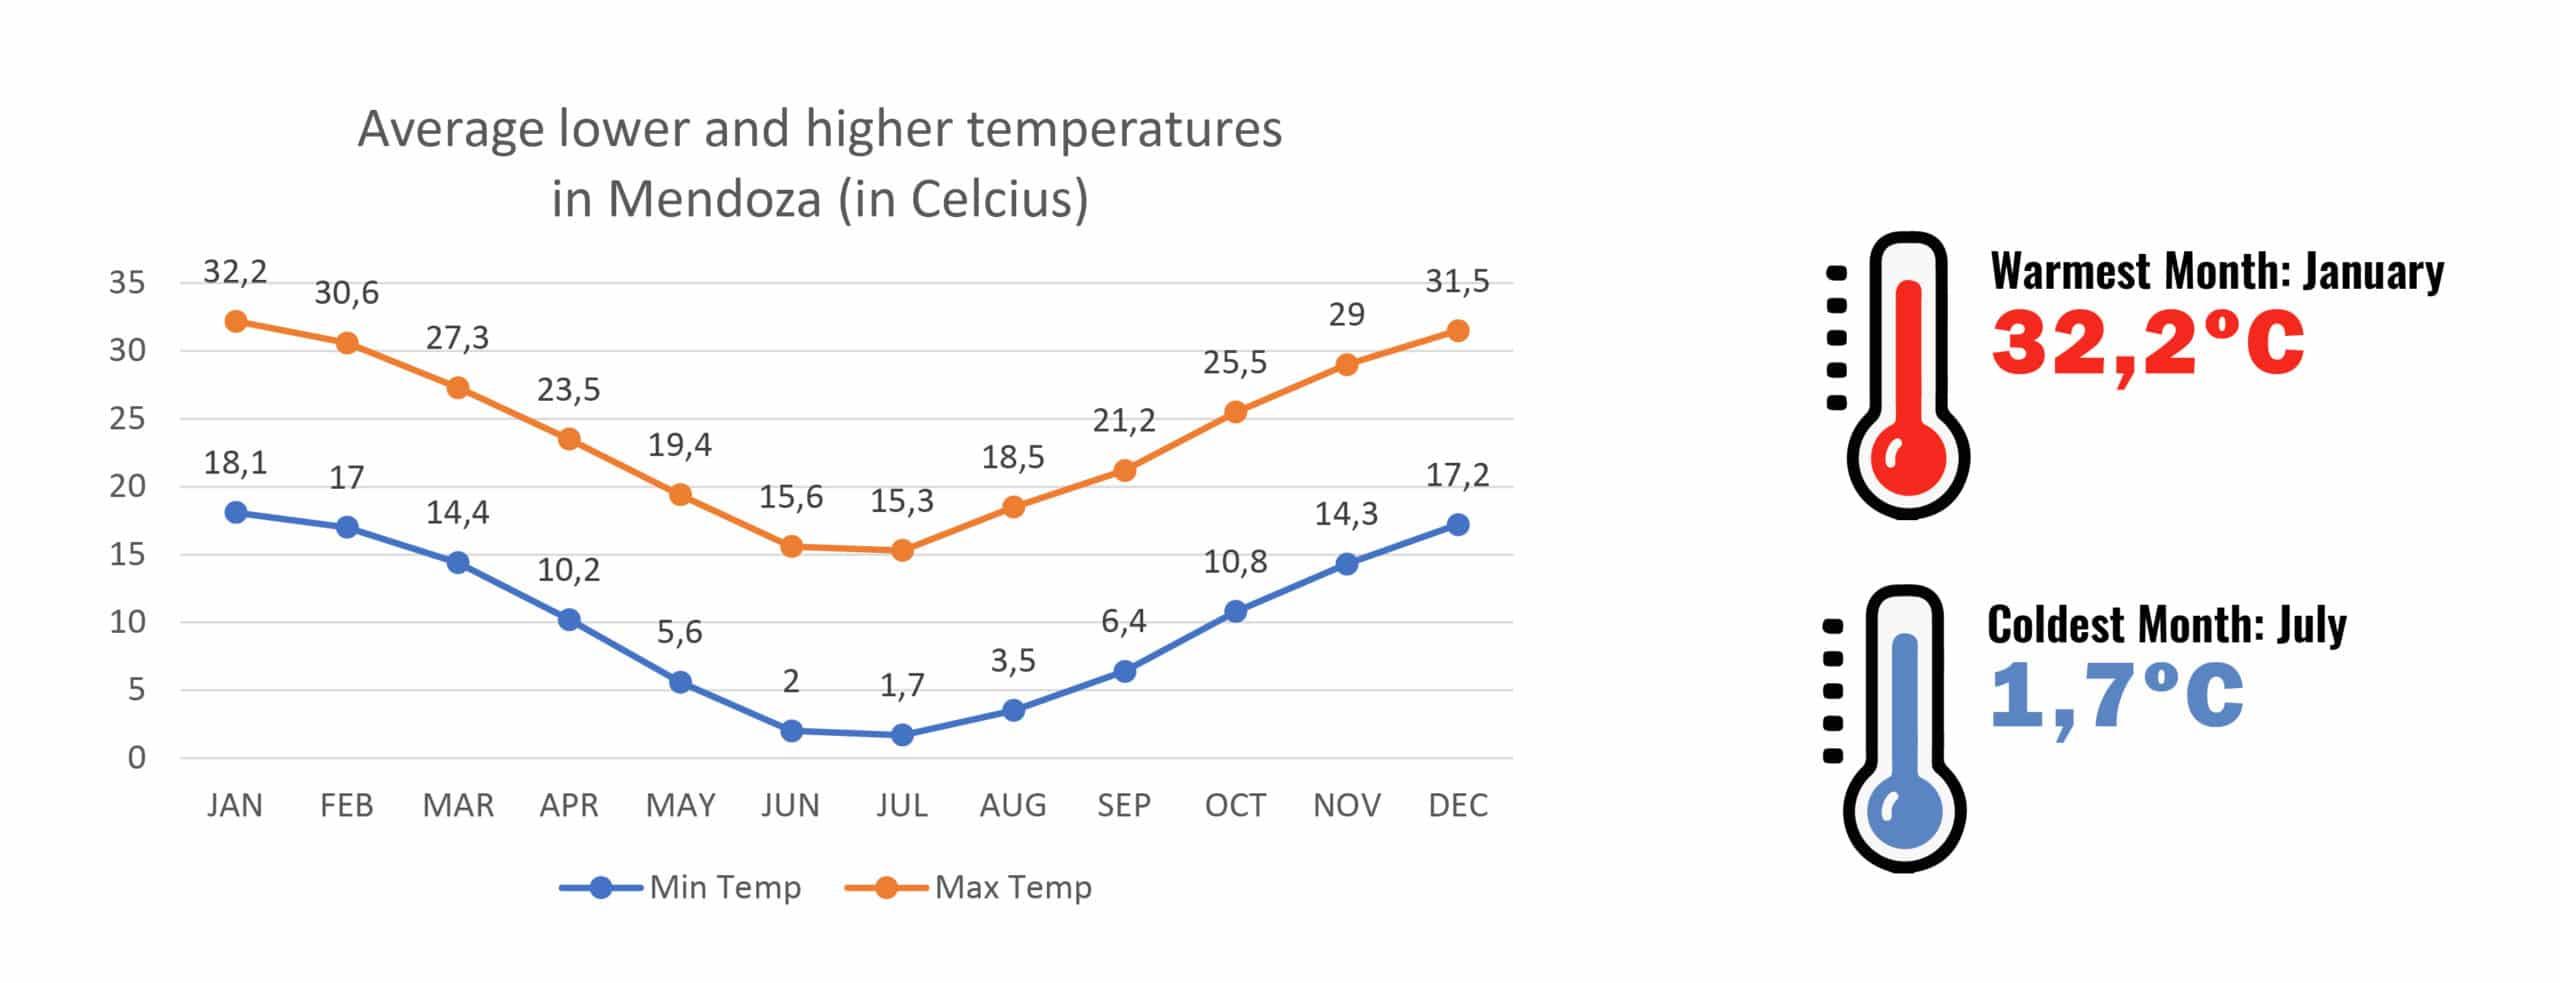 Temperatures in Mendoza - Weather in Mendoza, month by month - RipioTurismo DMC